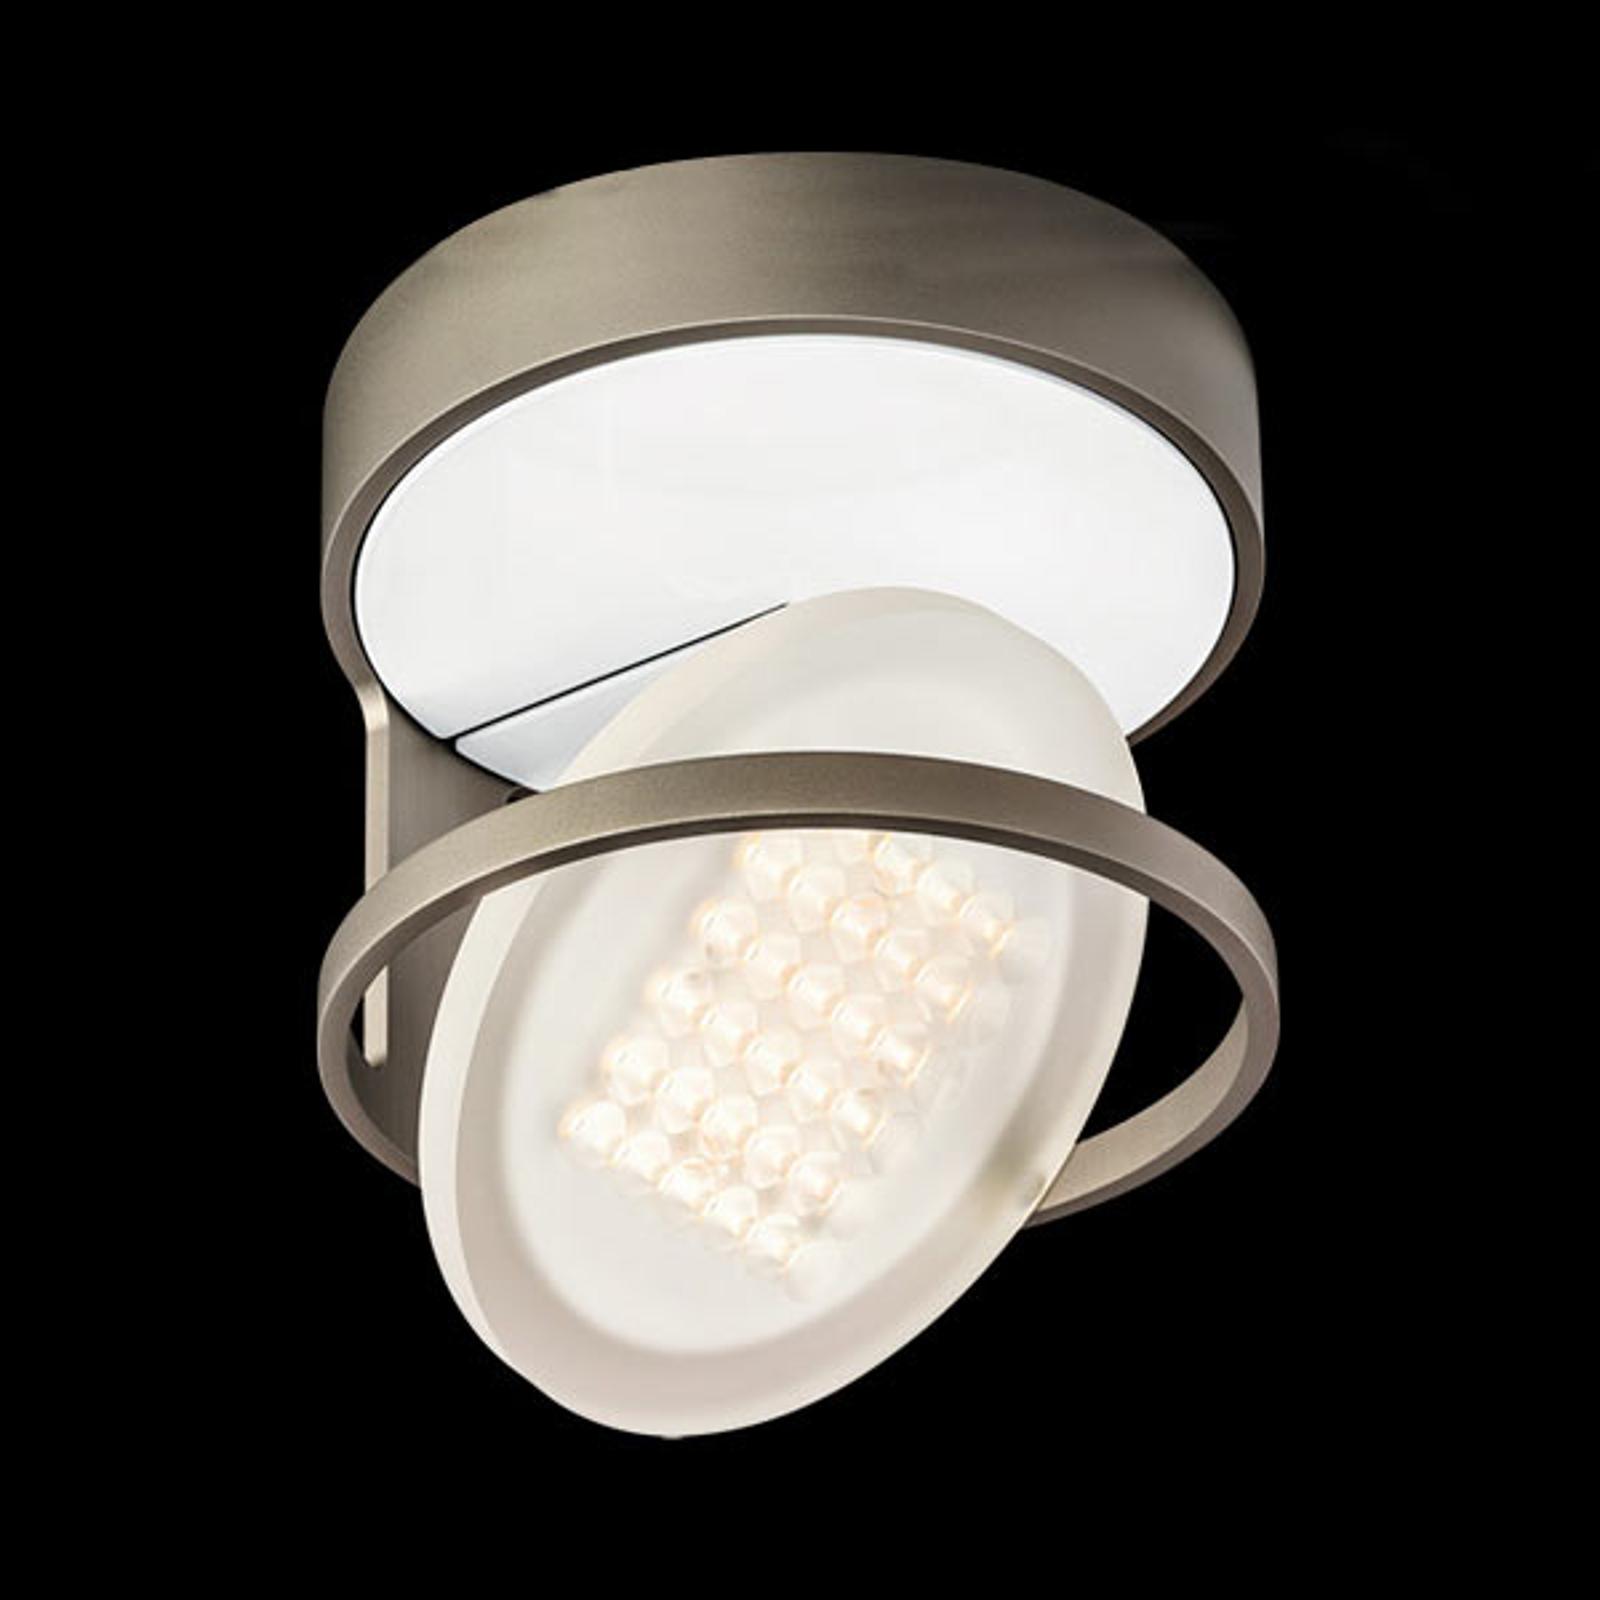 Nimbus Rim R 36 plafonnier LED, gris titane